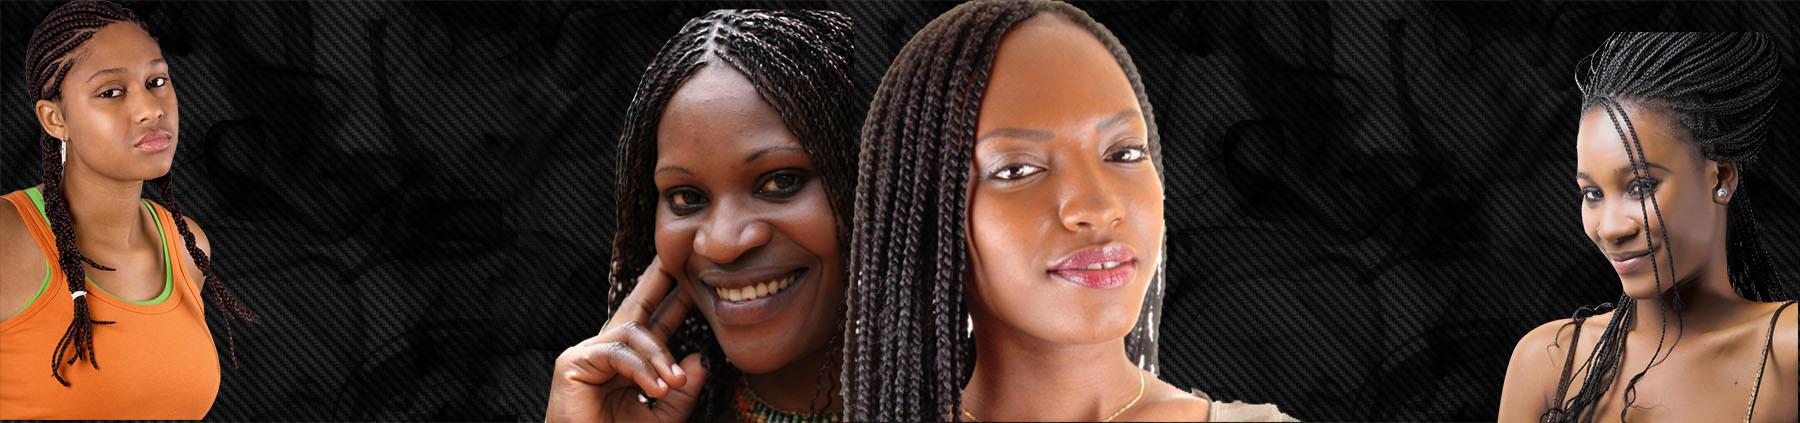 S&Y AFRICAN HAIR BRAIDING image 0